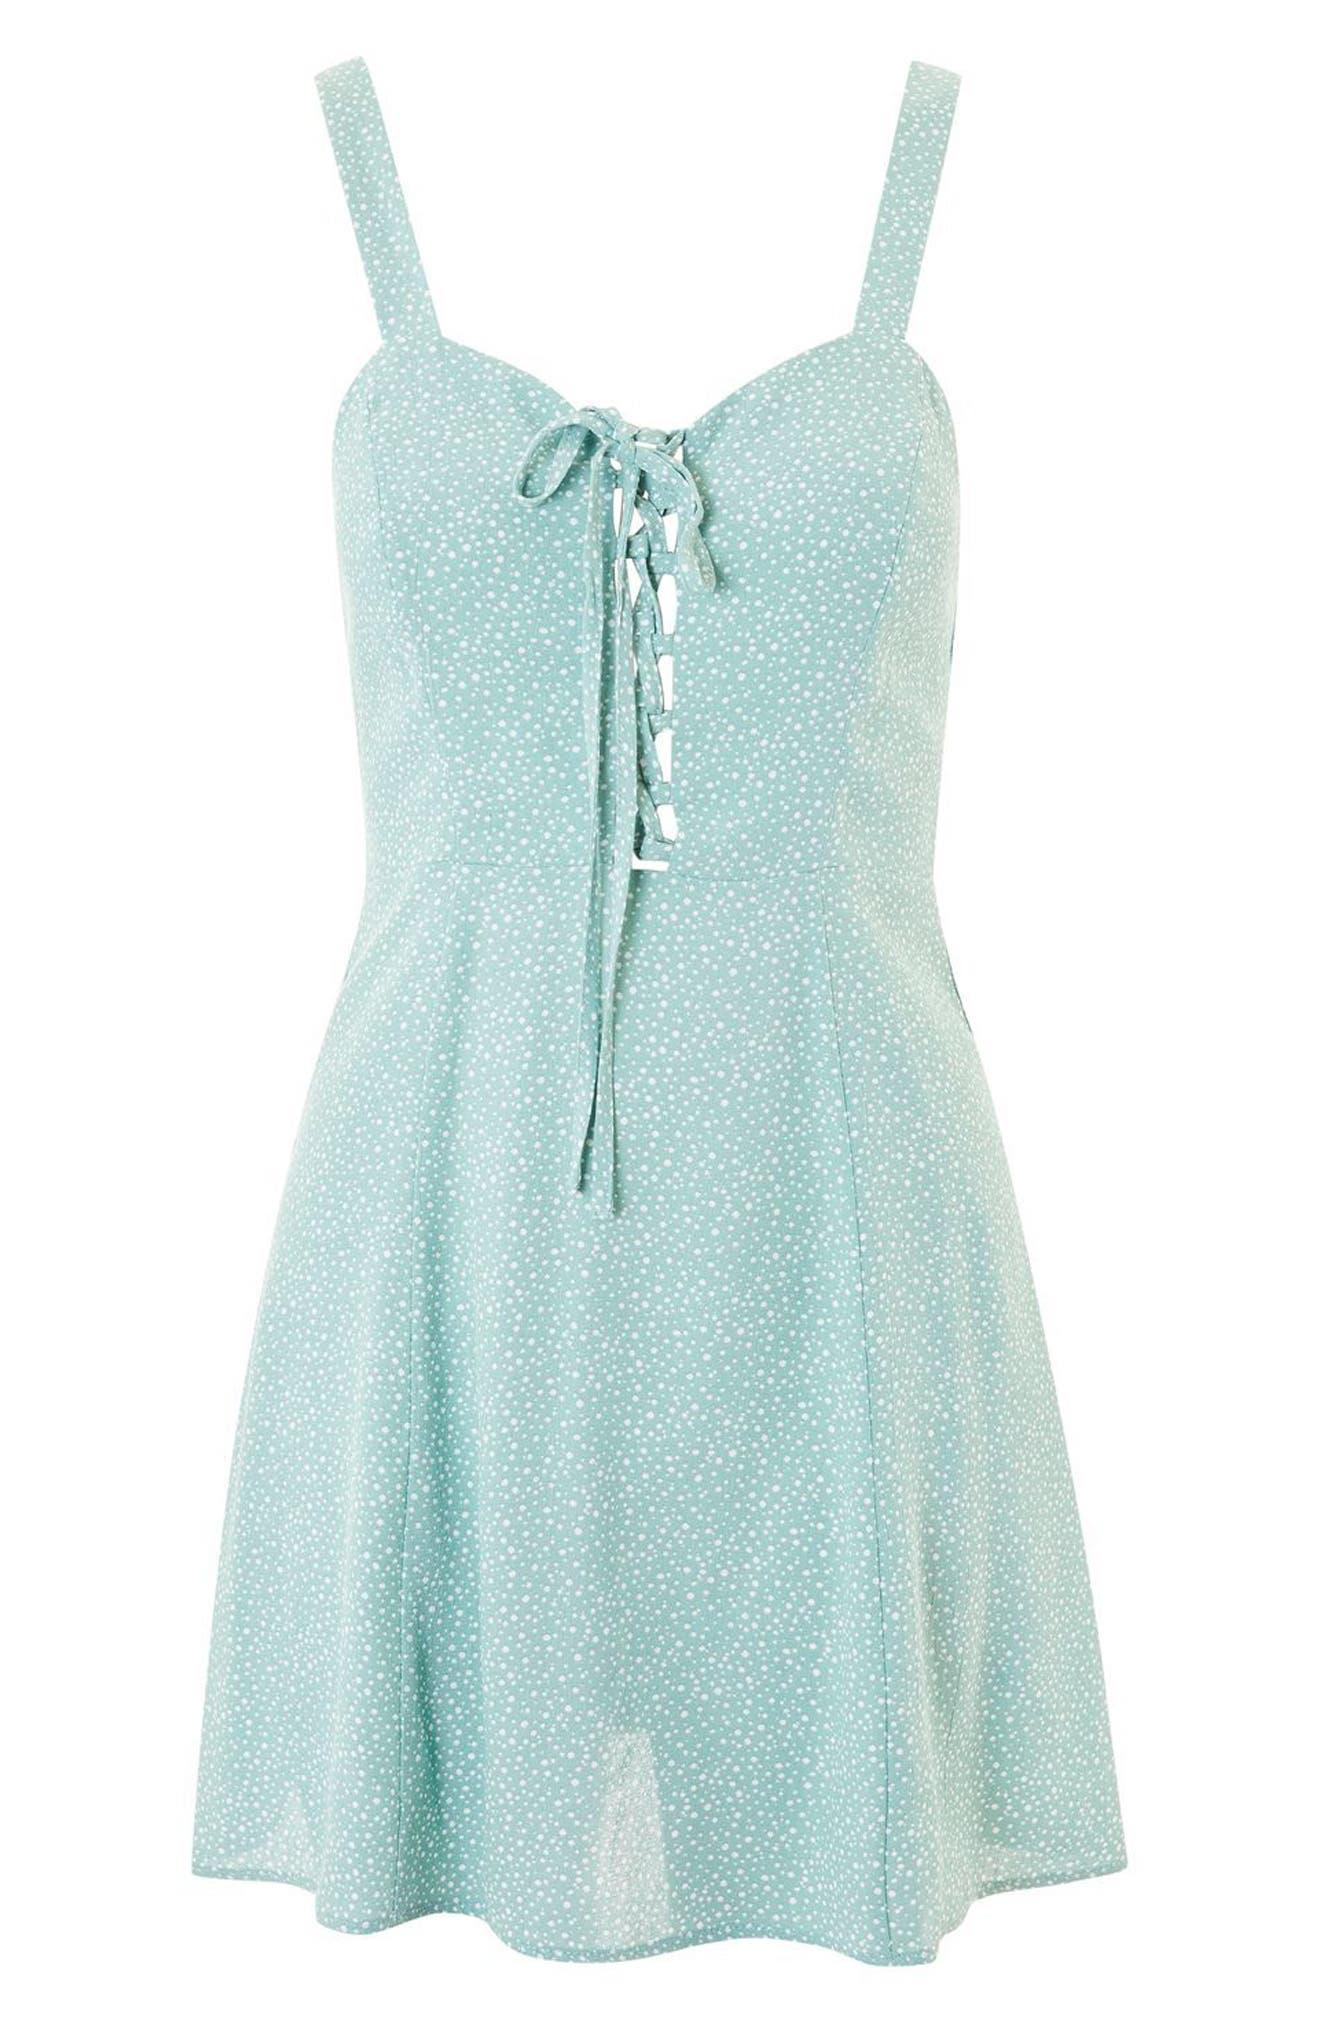 Alternate Image 3  - Topshop Polka Dot Lace-Up Minidress